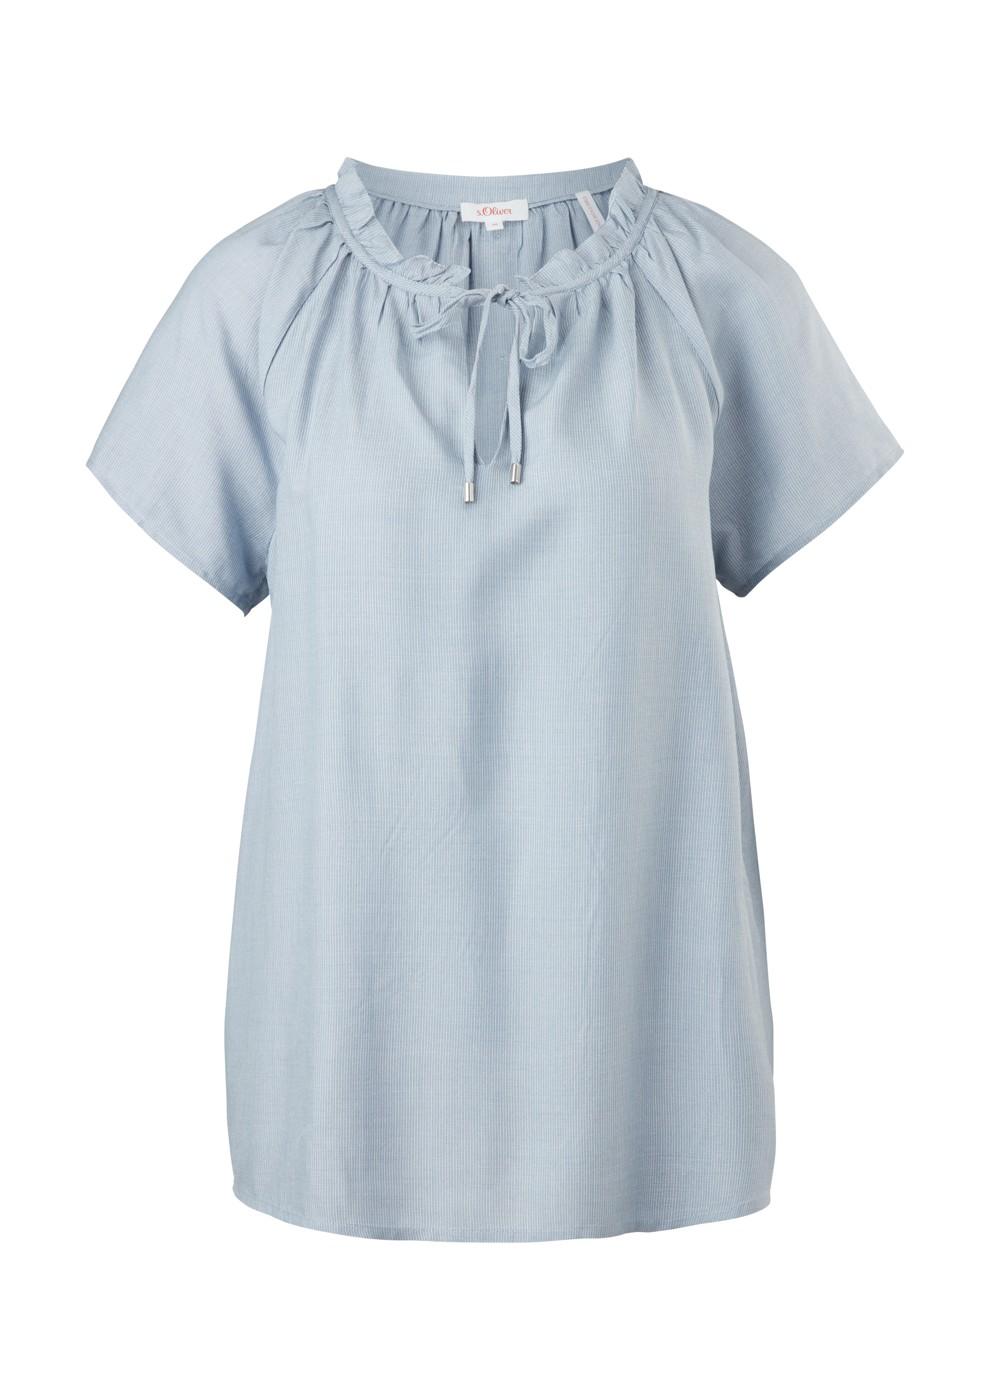 120 Bluse kurzarm - Damen